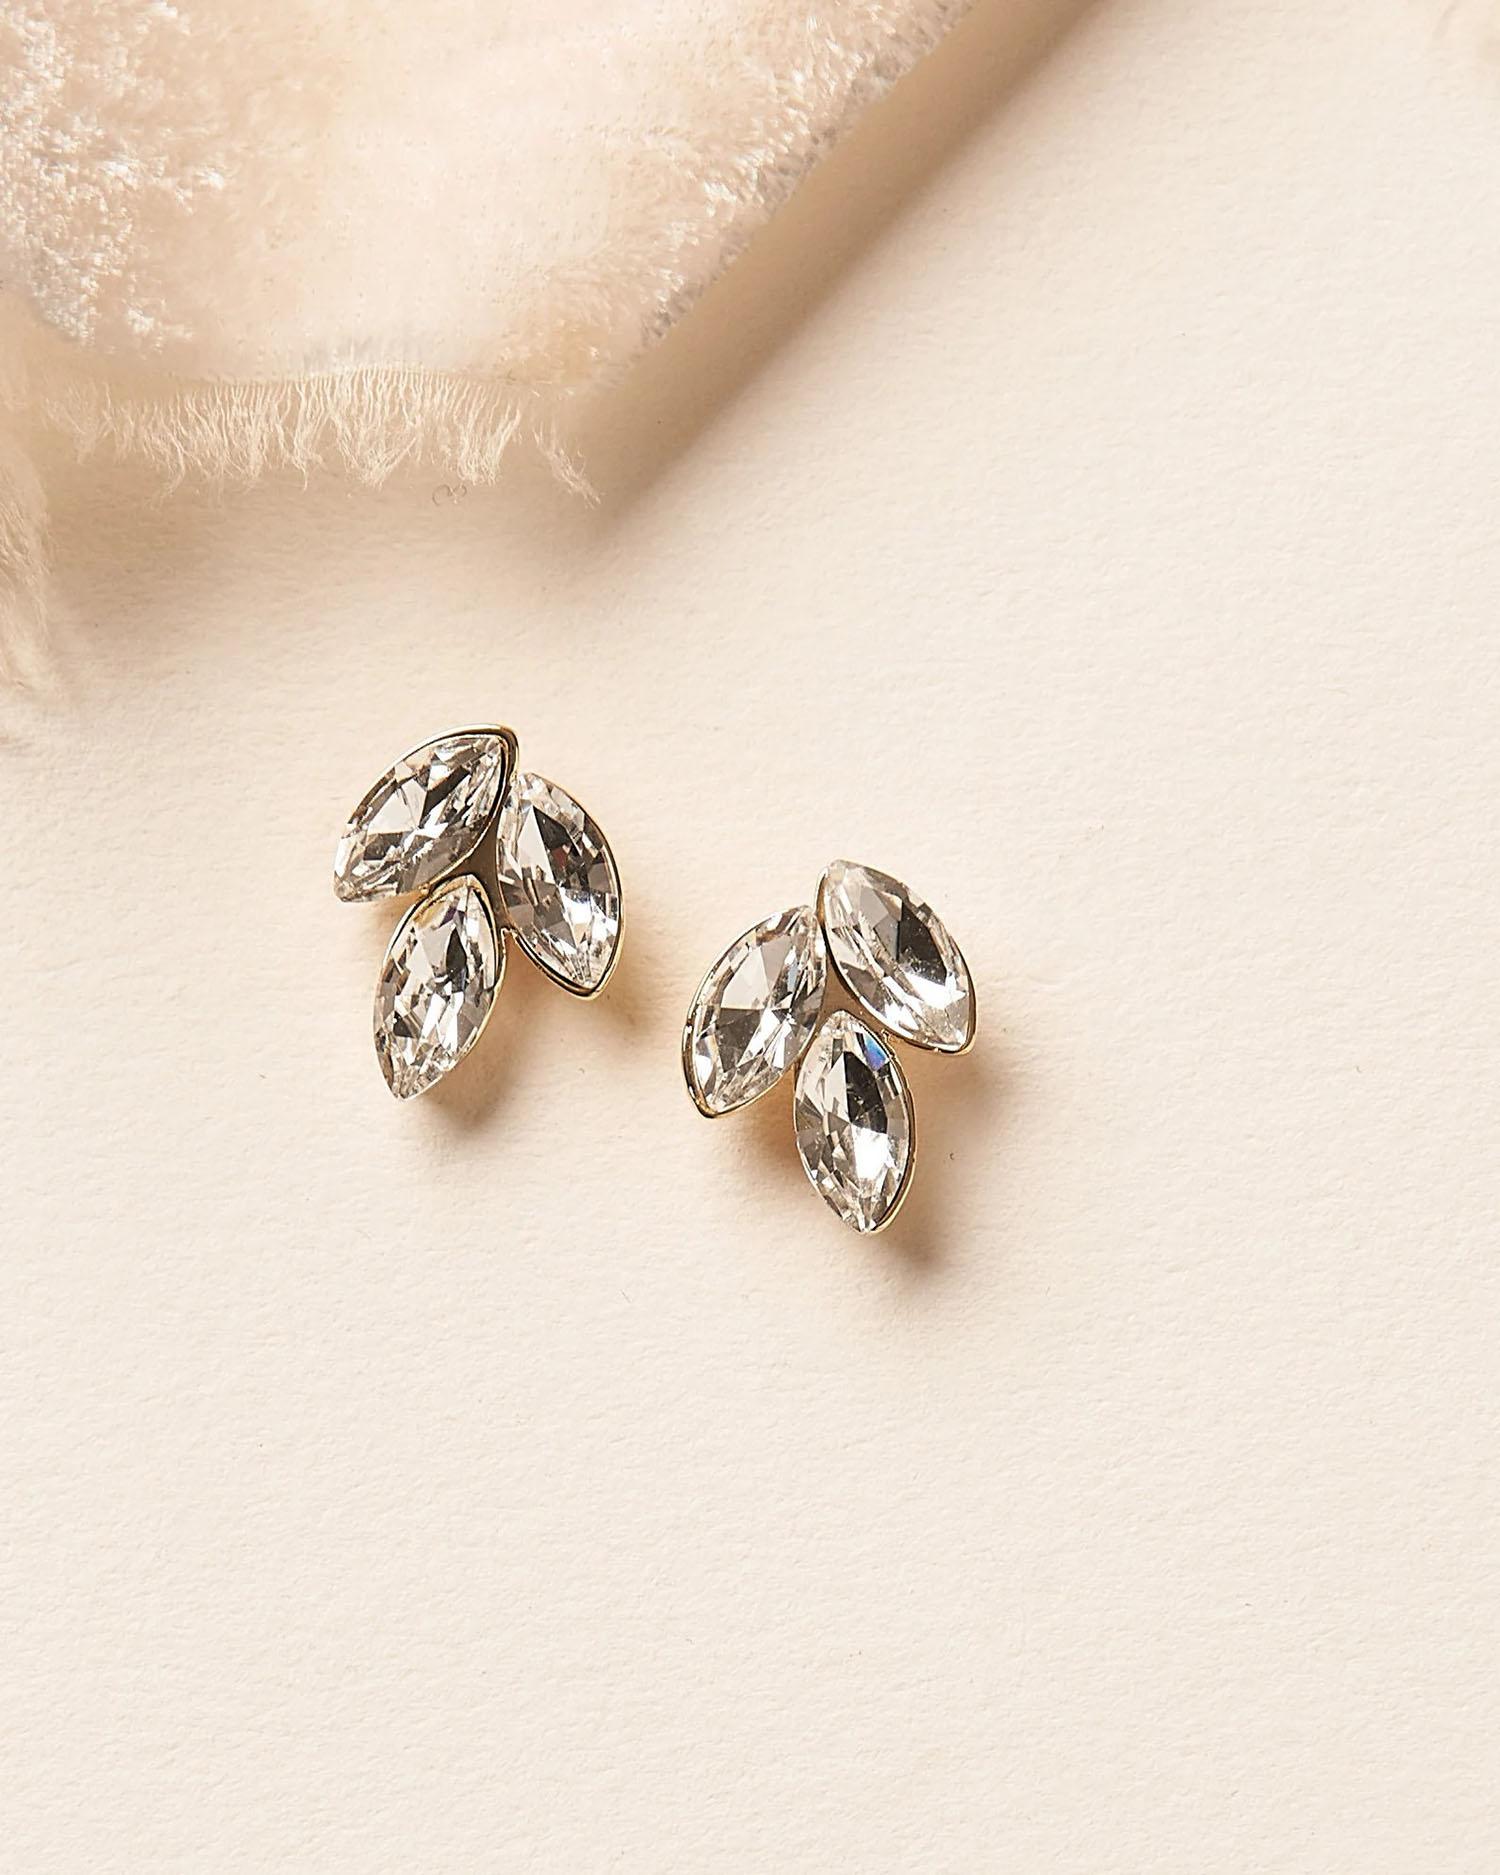 marquise cut stone trio silver wedding earrings